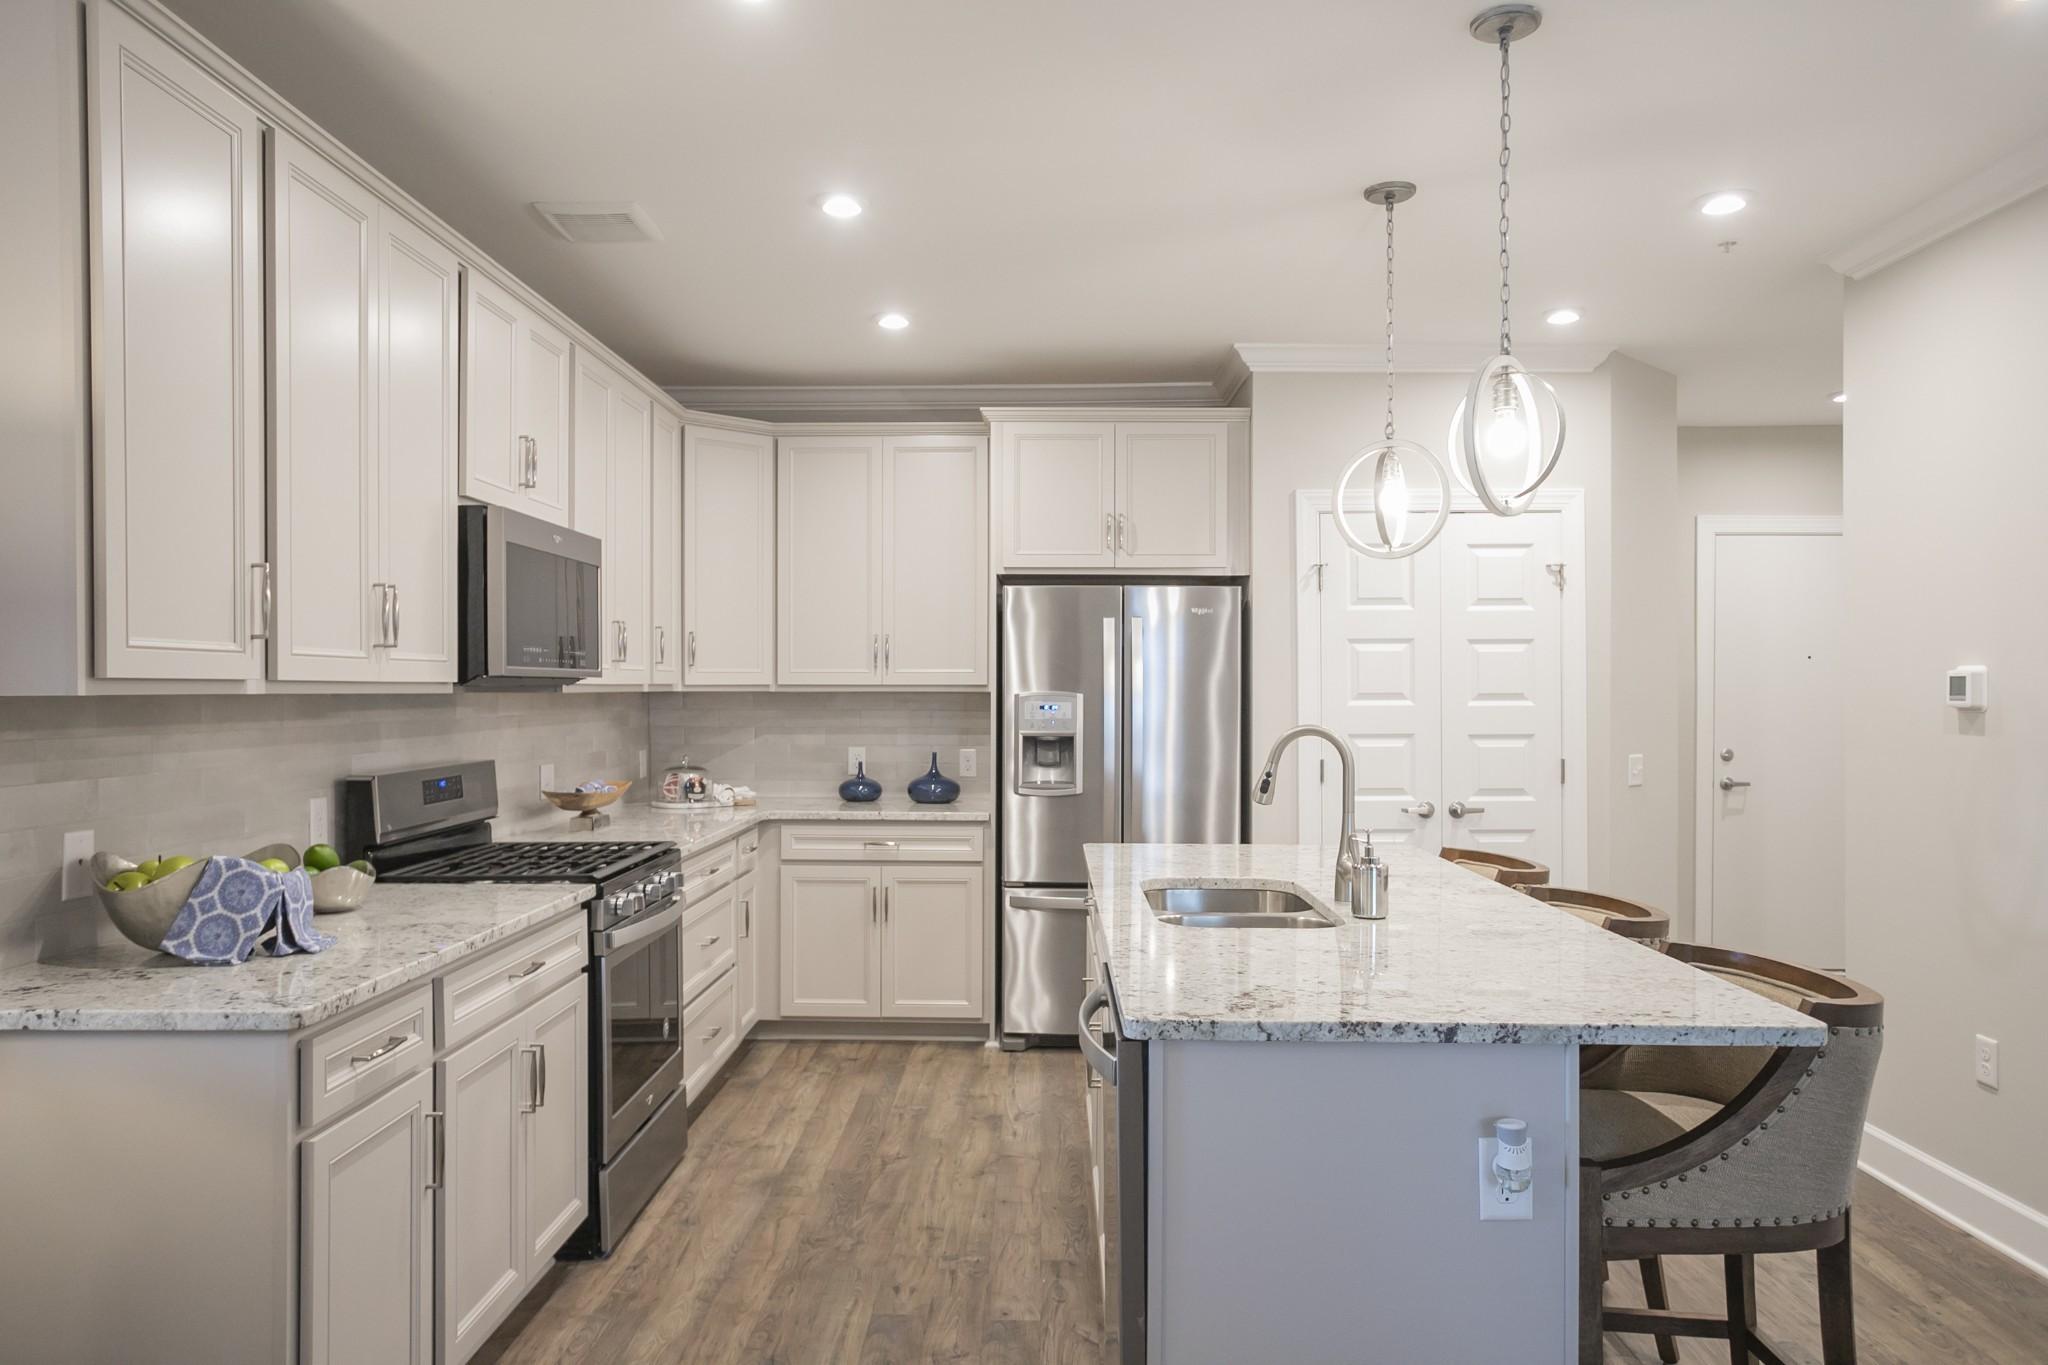 141 Saundersville Rd #2307 Property Photo - Hendersonville, TN real estate listing